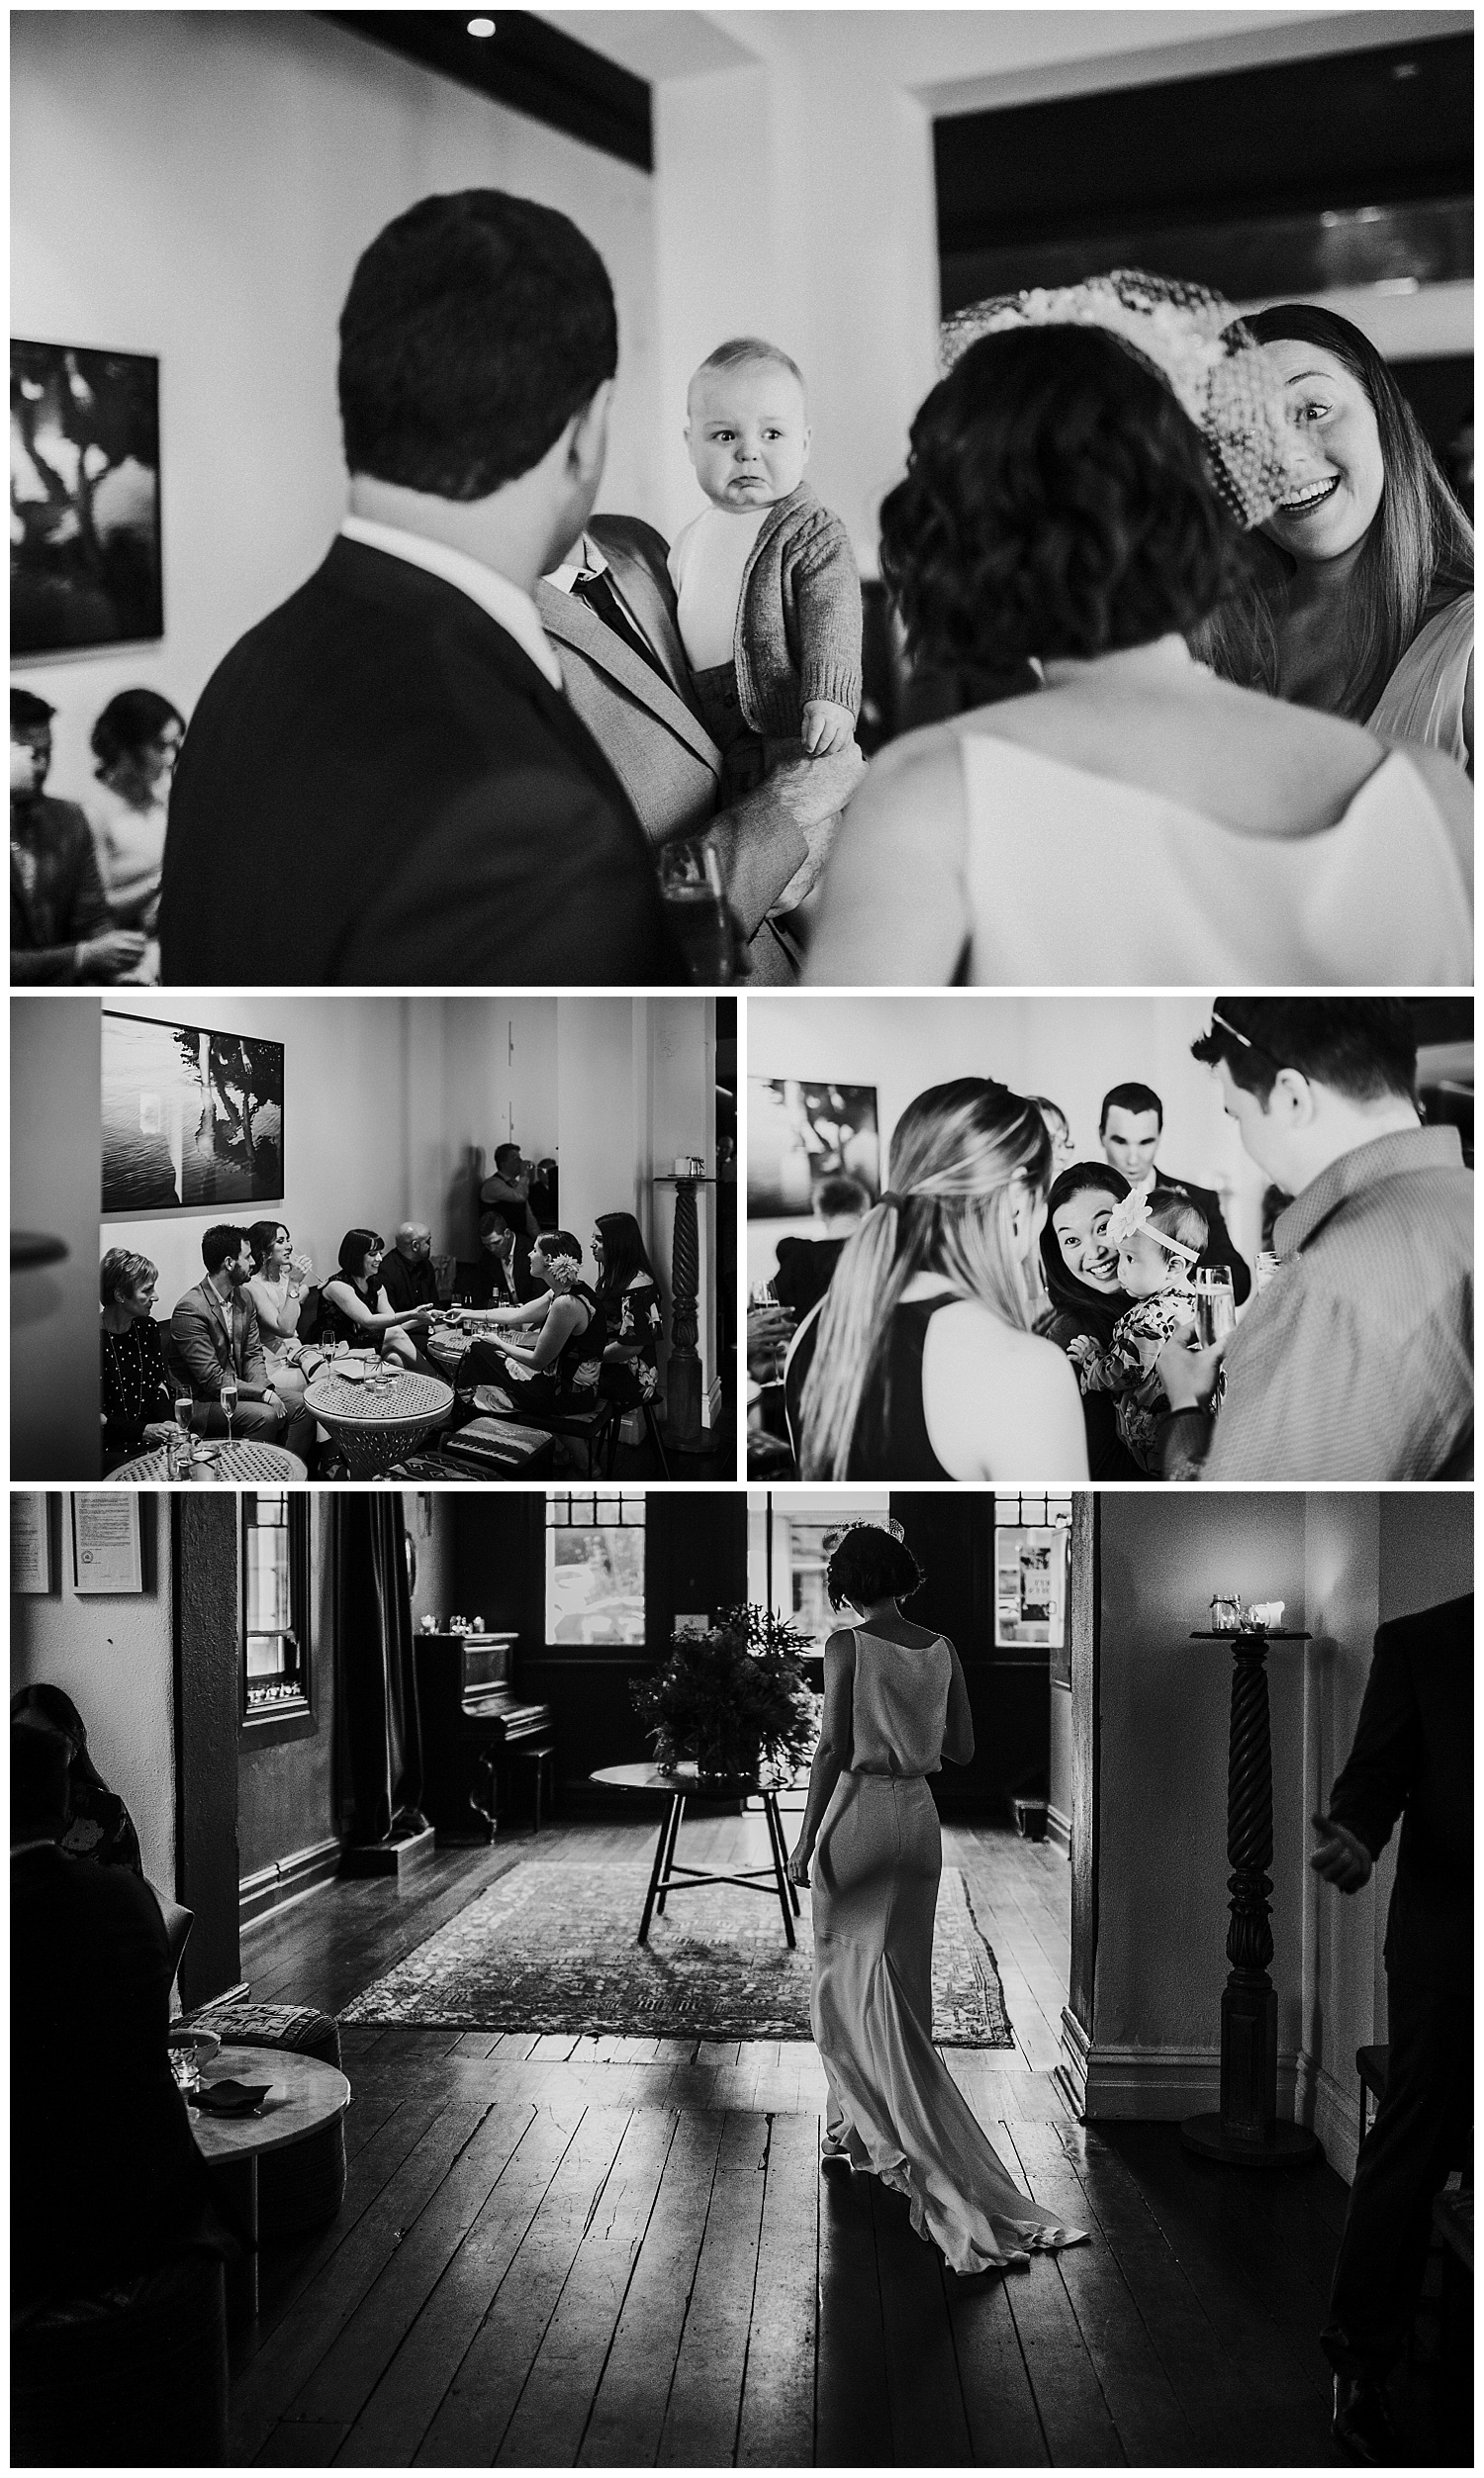 guildhall_wedding_keeper_creative_14.JPG